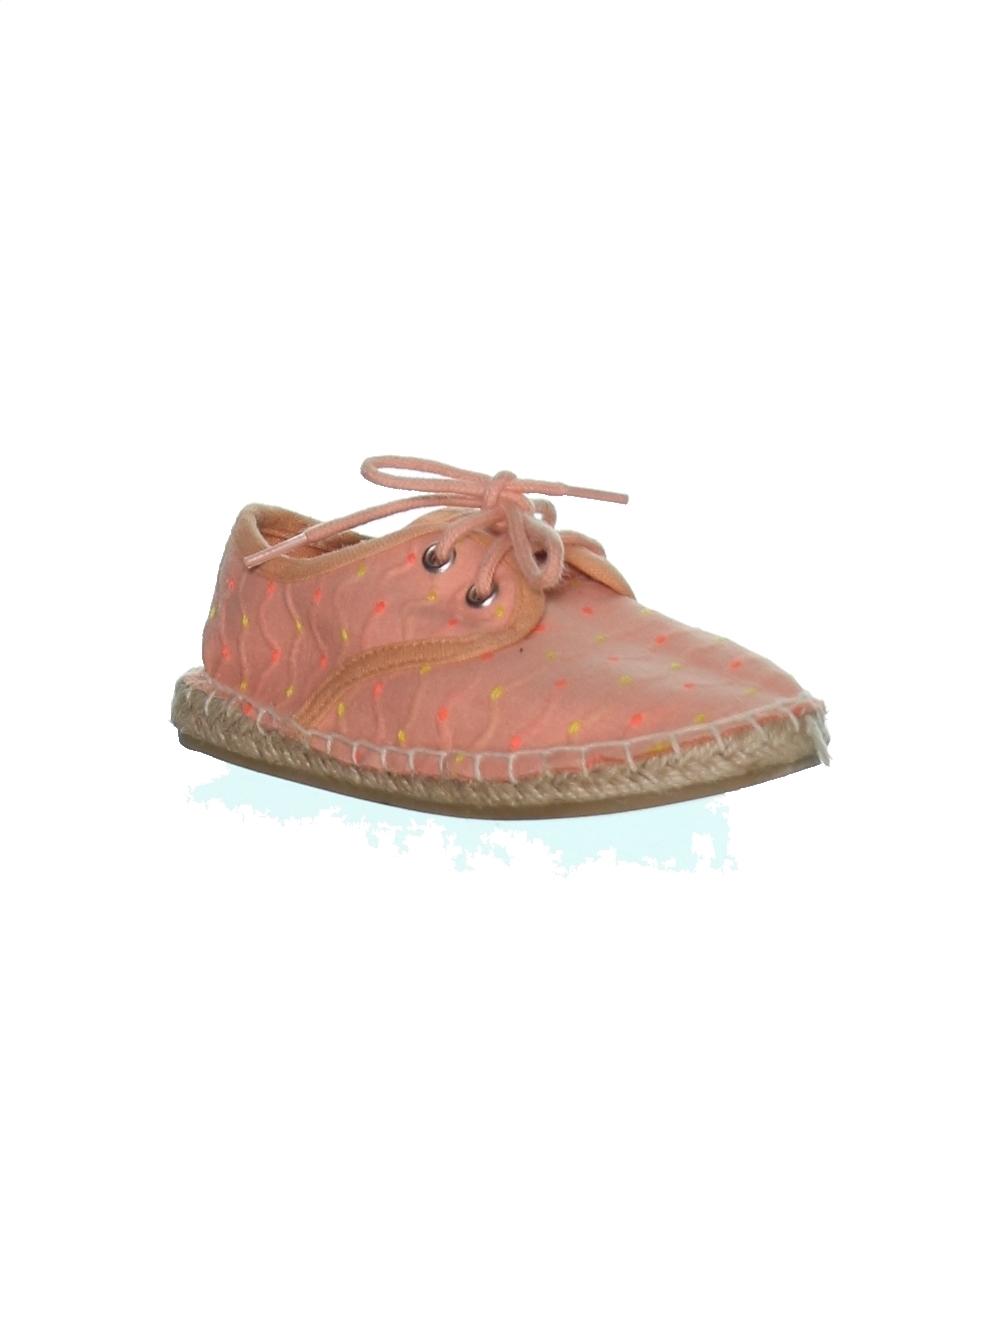 dbeb6b20f5e4db Chaussures à lacets Fille KIABI 24 pas cher, 9.25 € - #1240326